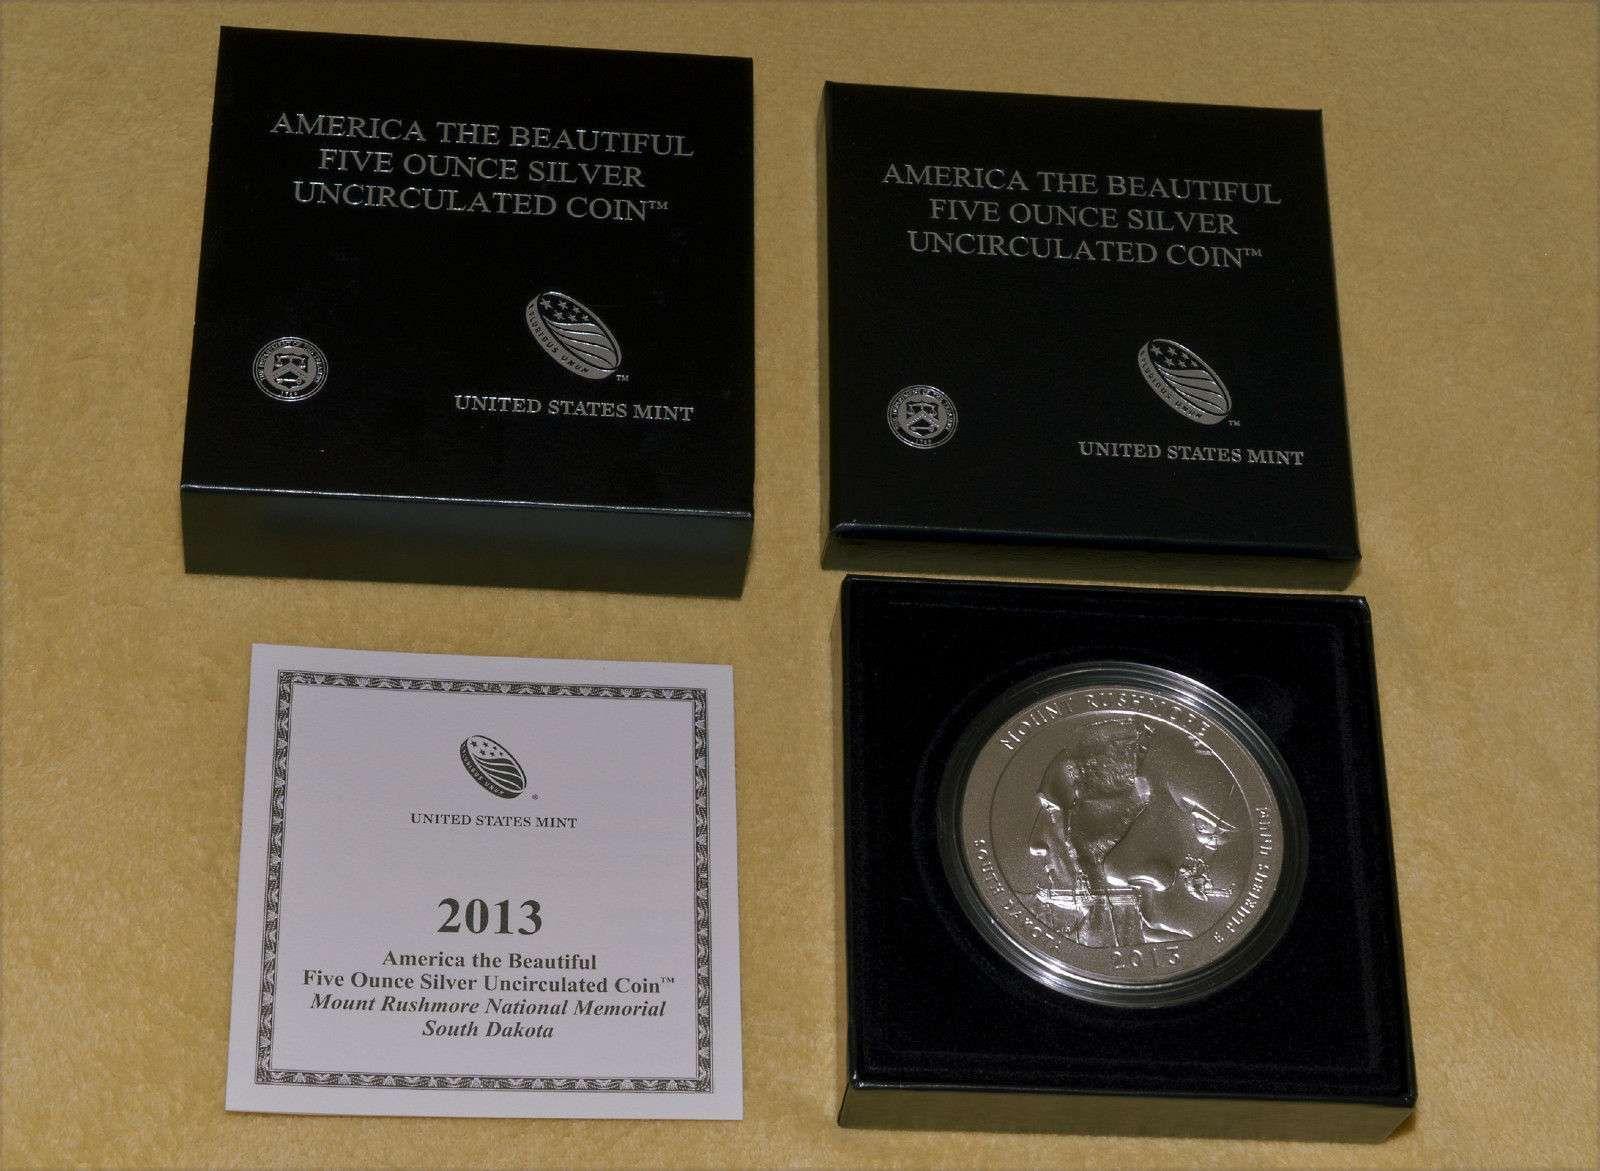 2013 P America The Beautiful Mt. Rushmore 5 Oz Silver Uncirculated Coin